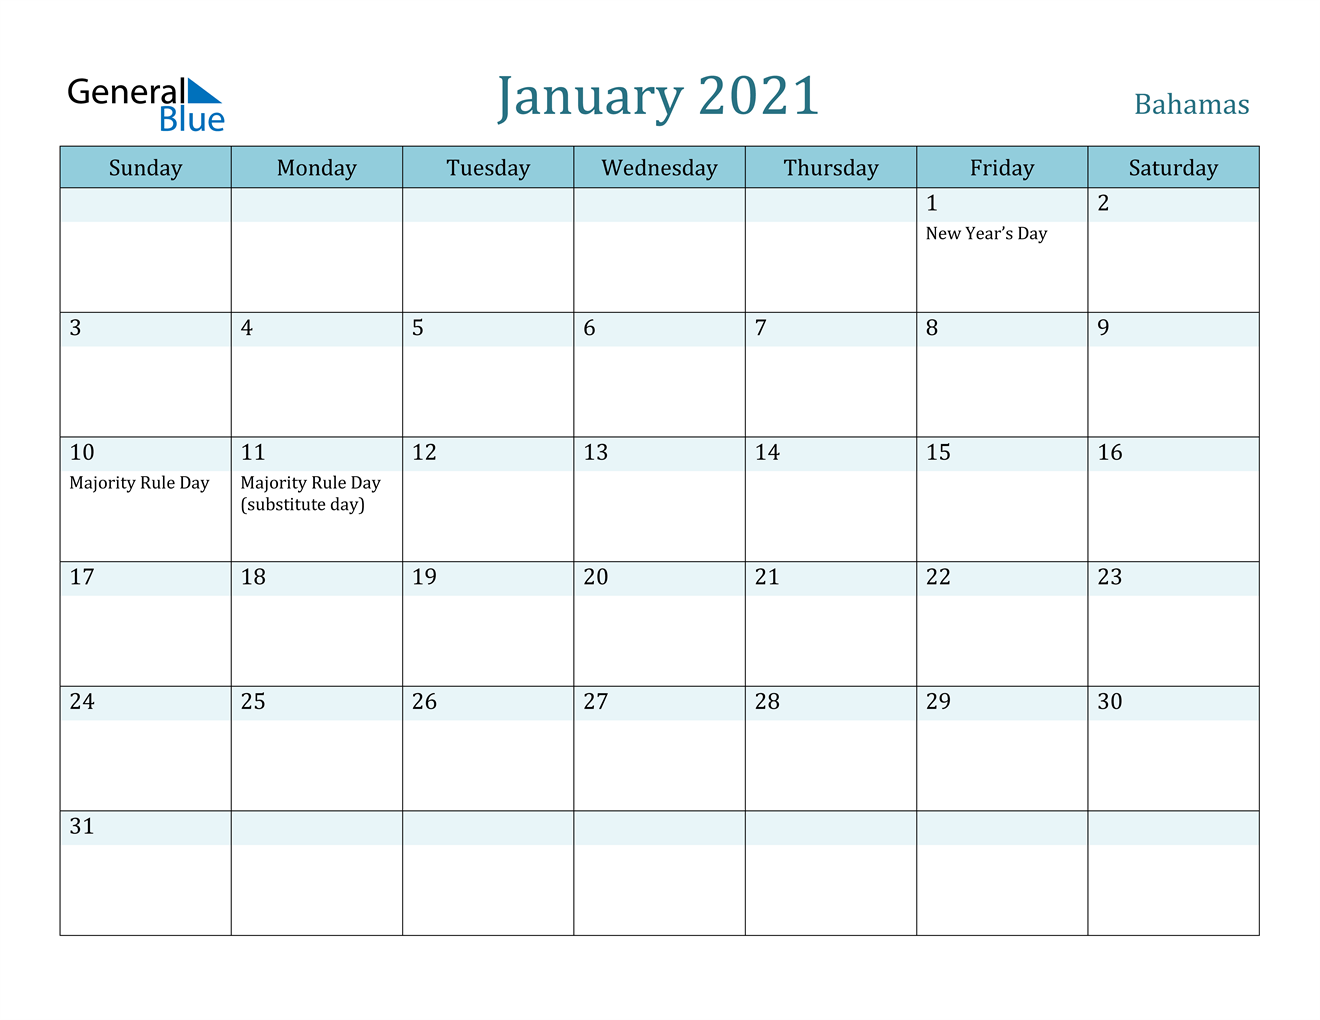 January 2021 Calendar - Bahamas